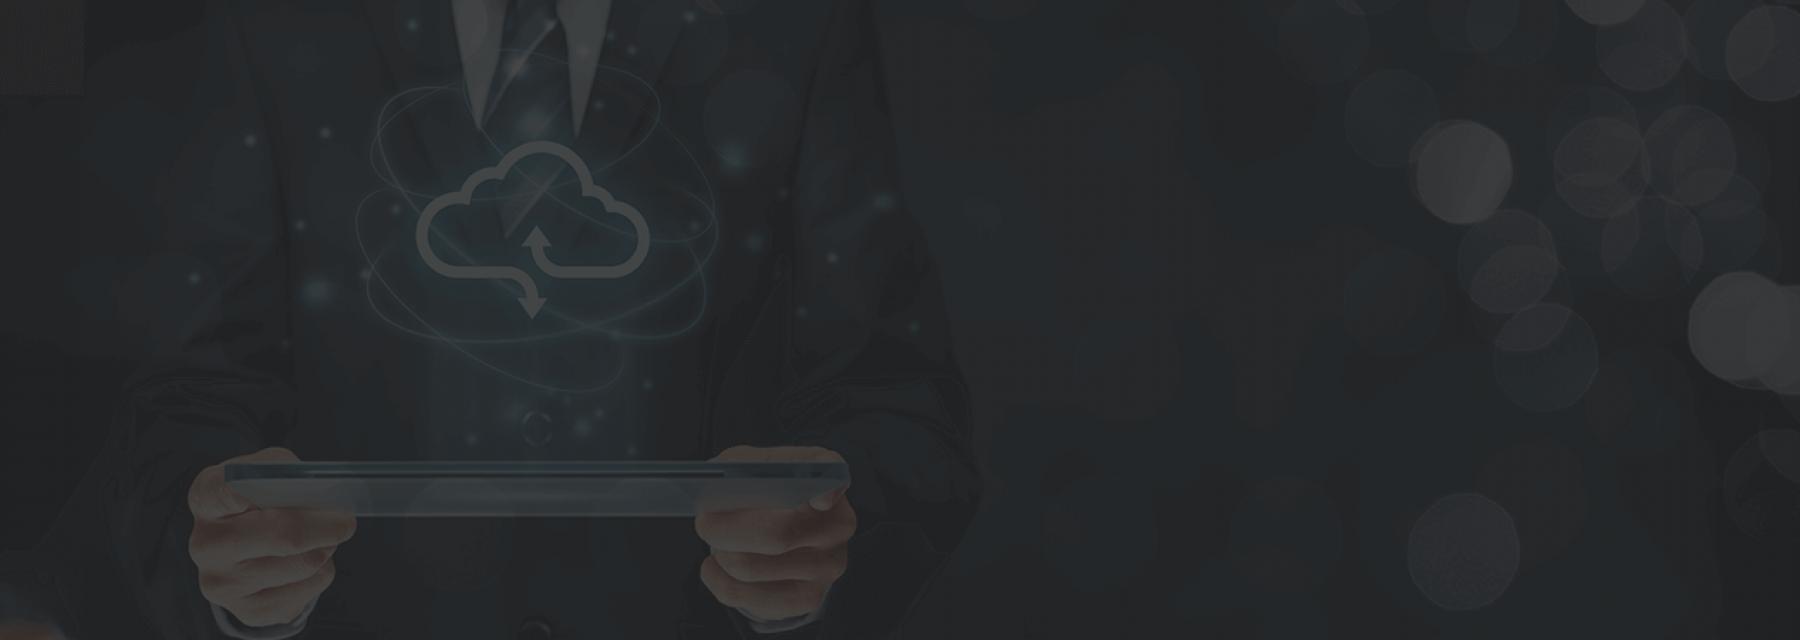 Gartner Cloud Adaption